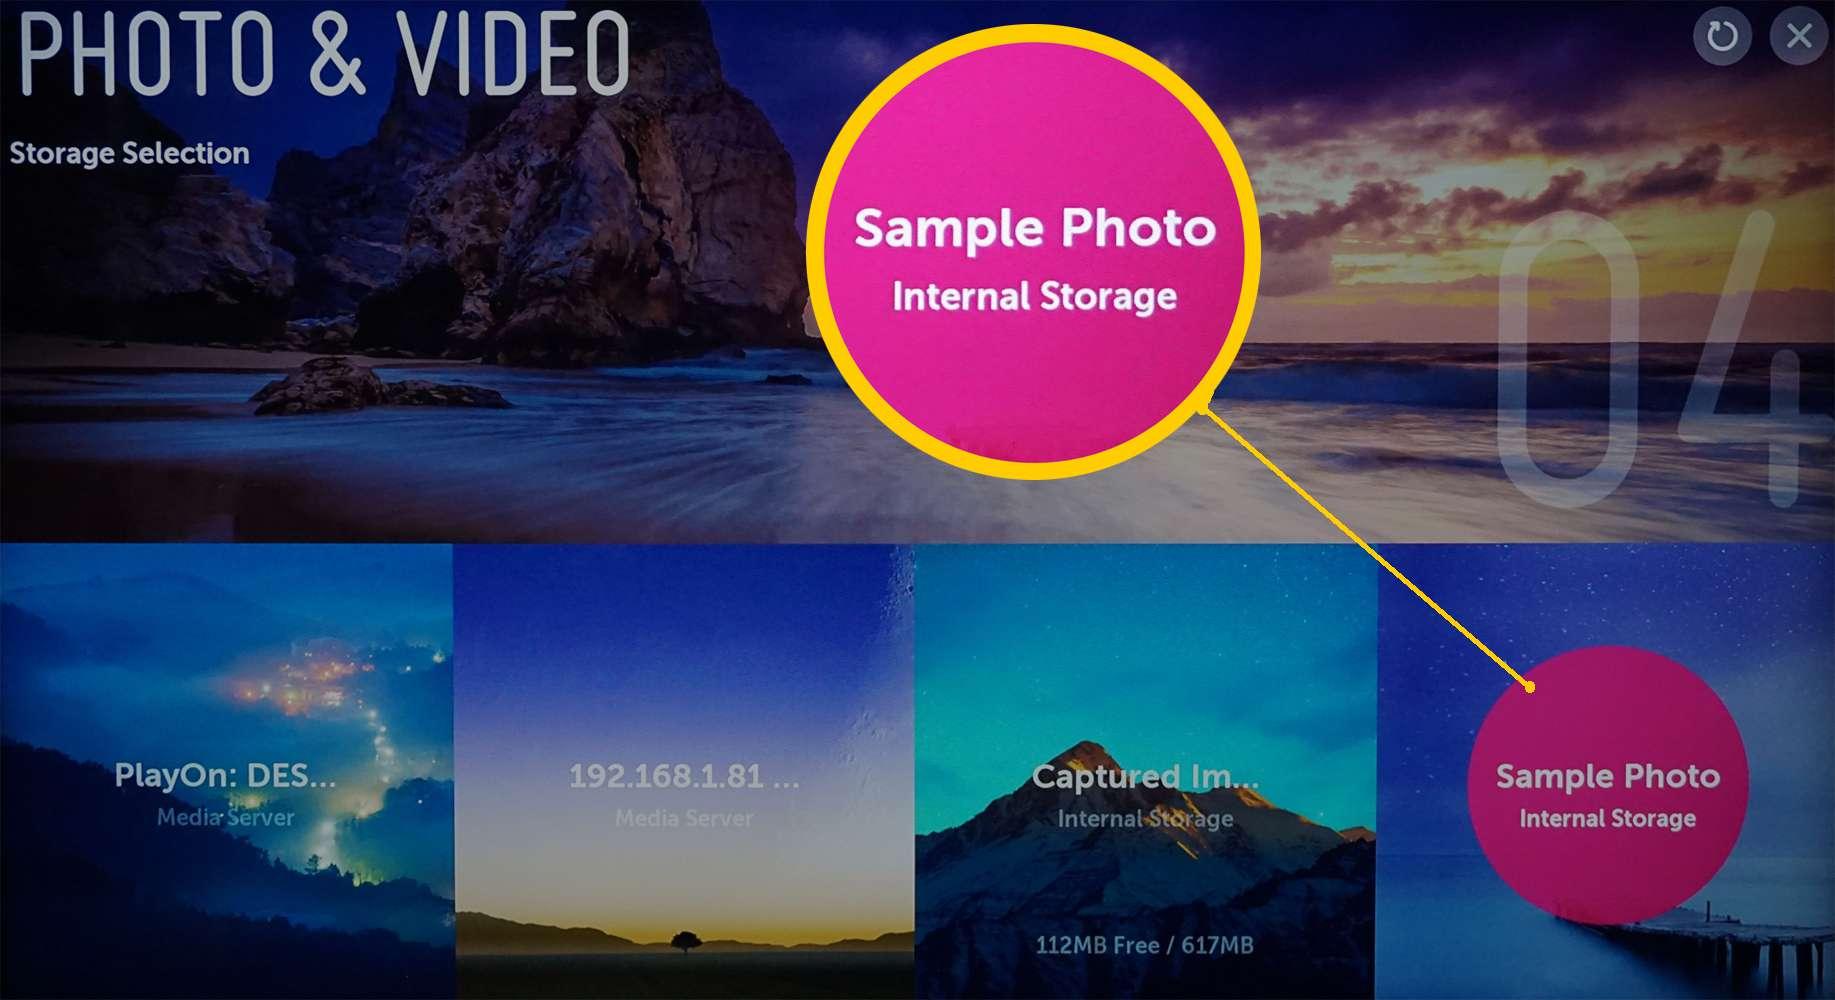 LG 4K Ultra HD TV – Photo Video Media Servers – Sample Images Selection